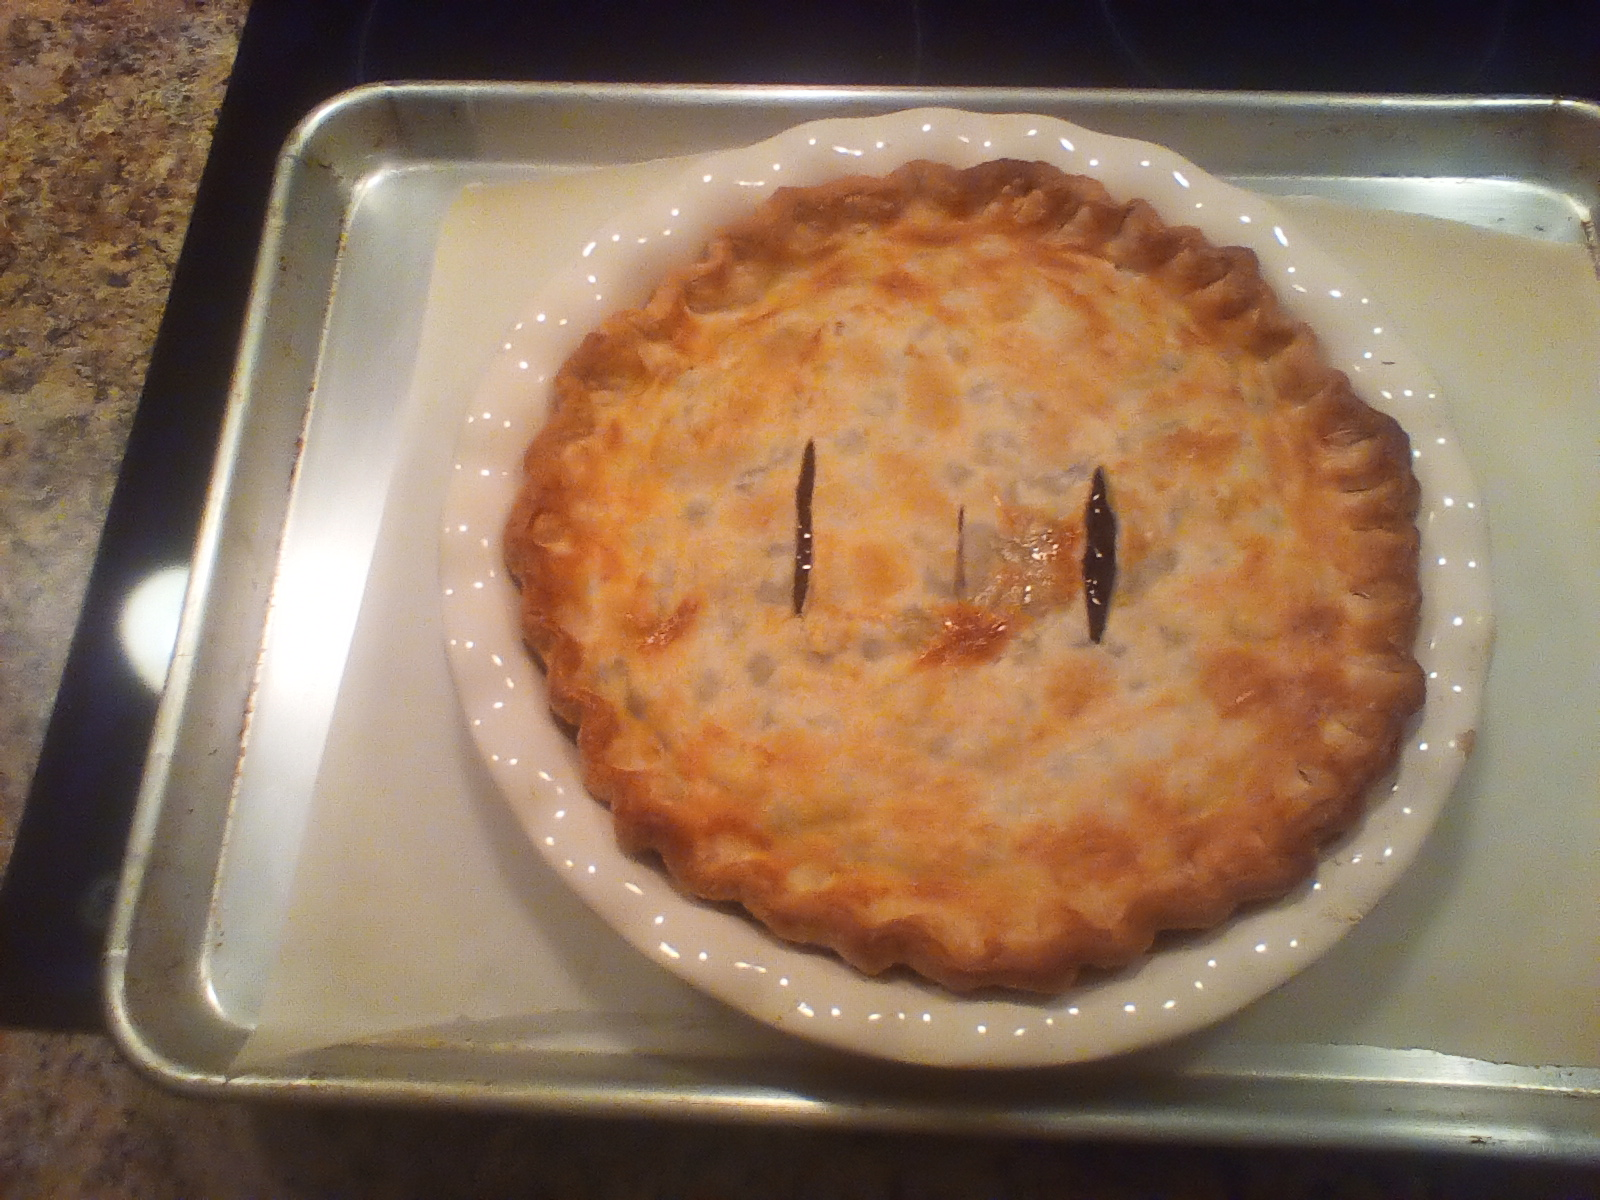 Blueberry Pie with Frozen Berries Nancy Lowry